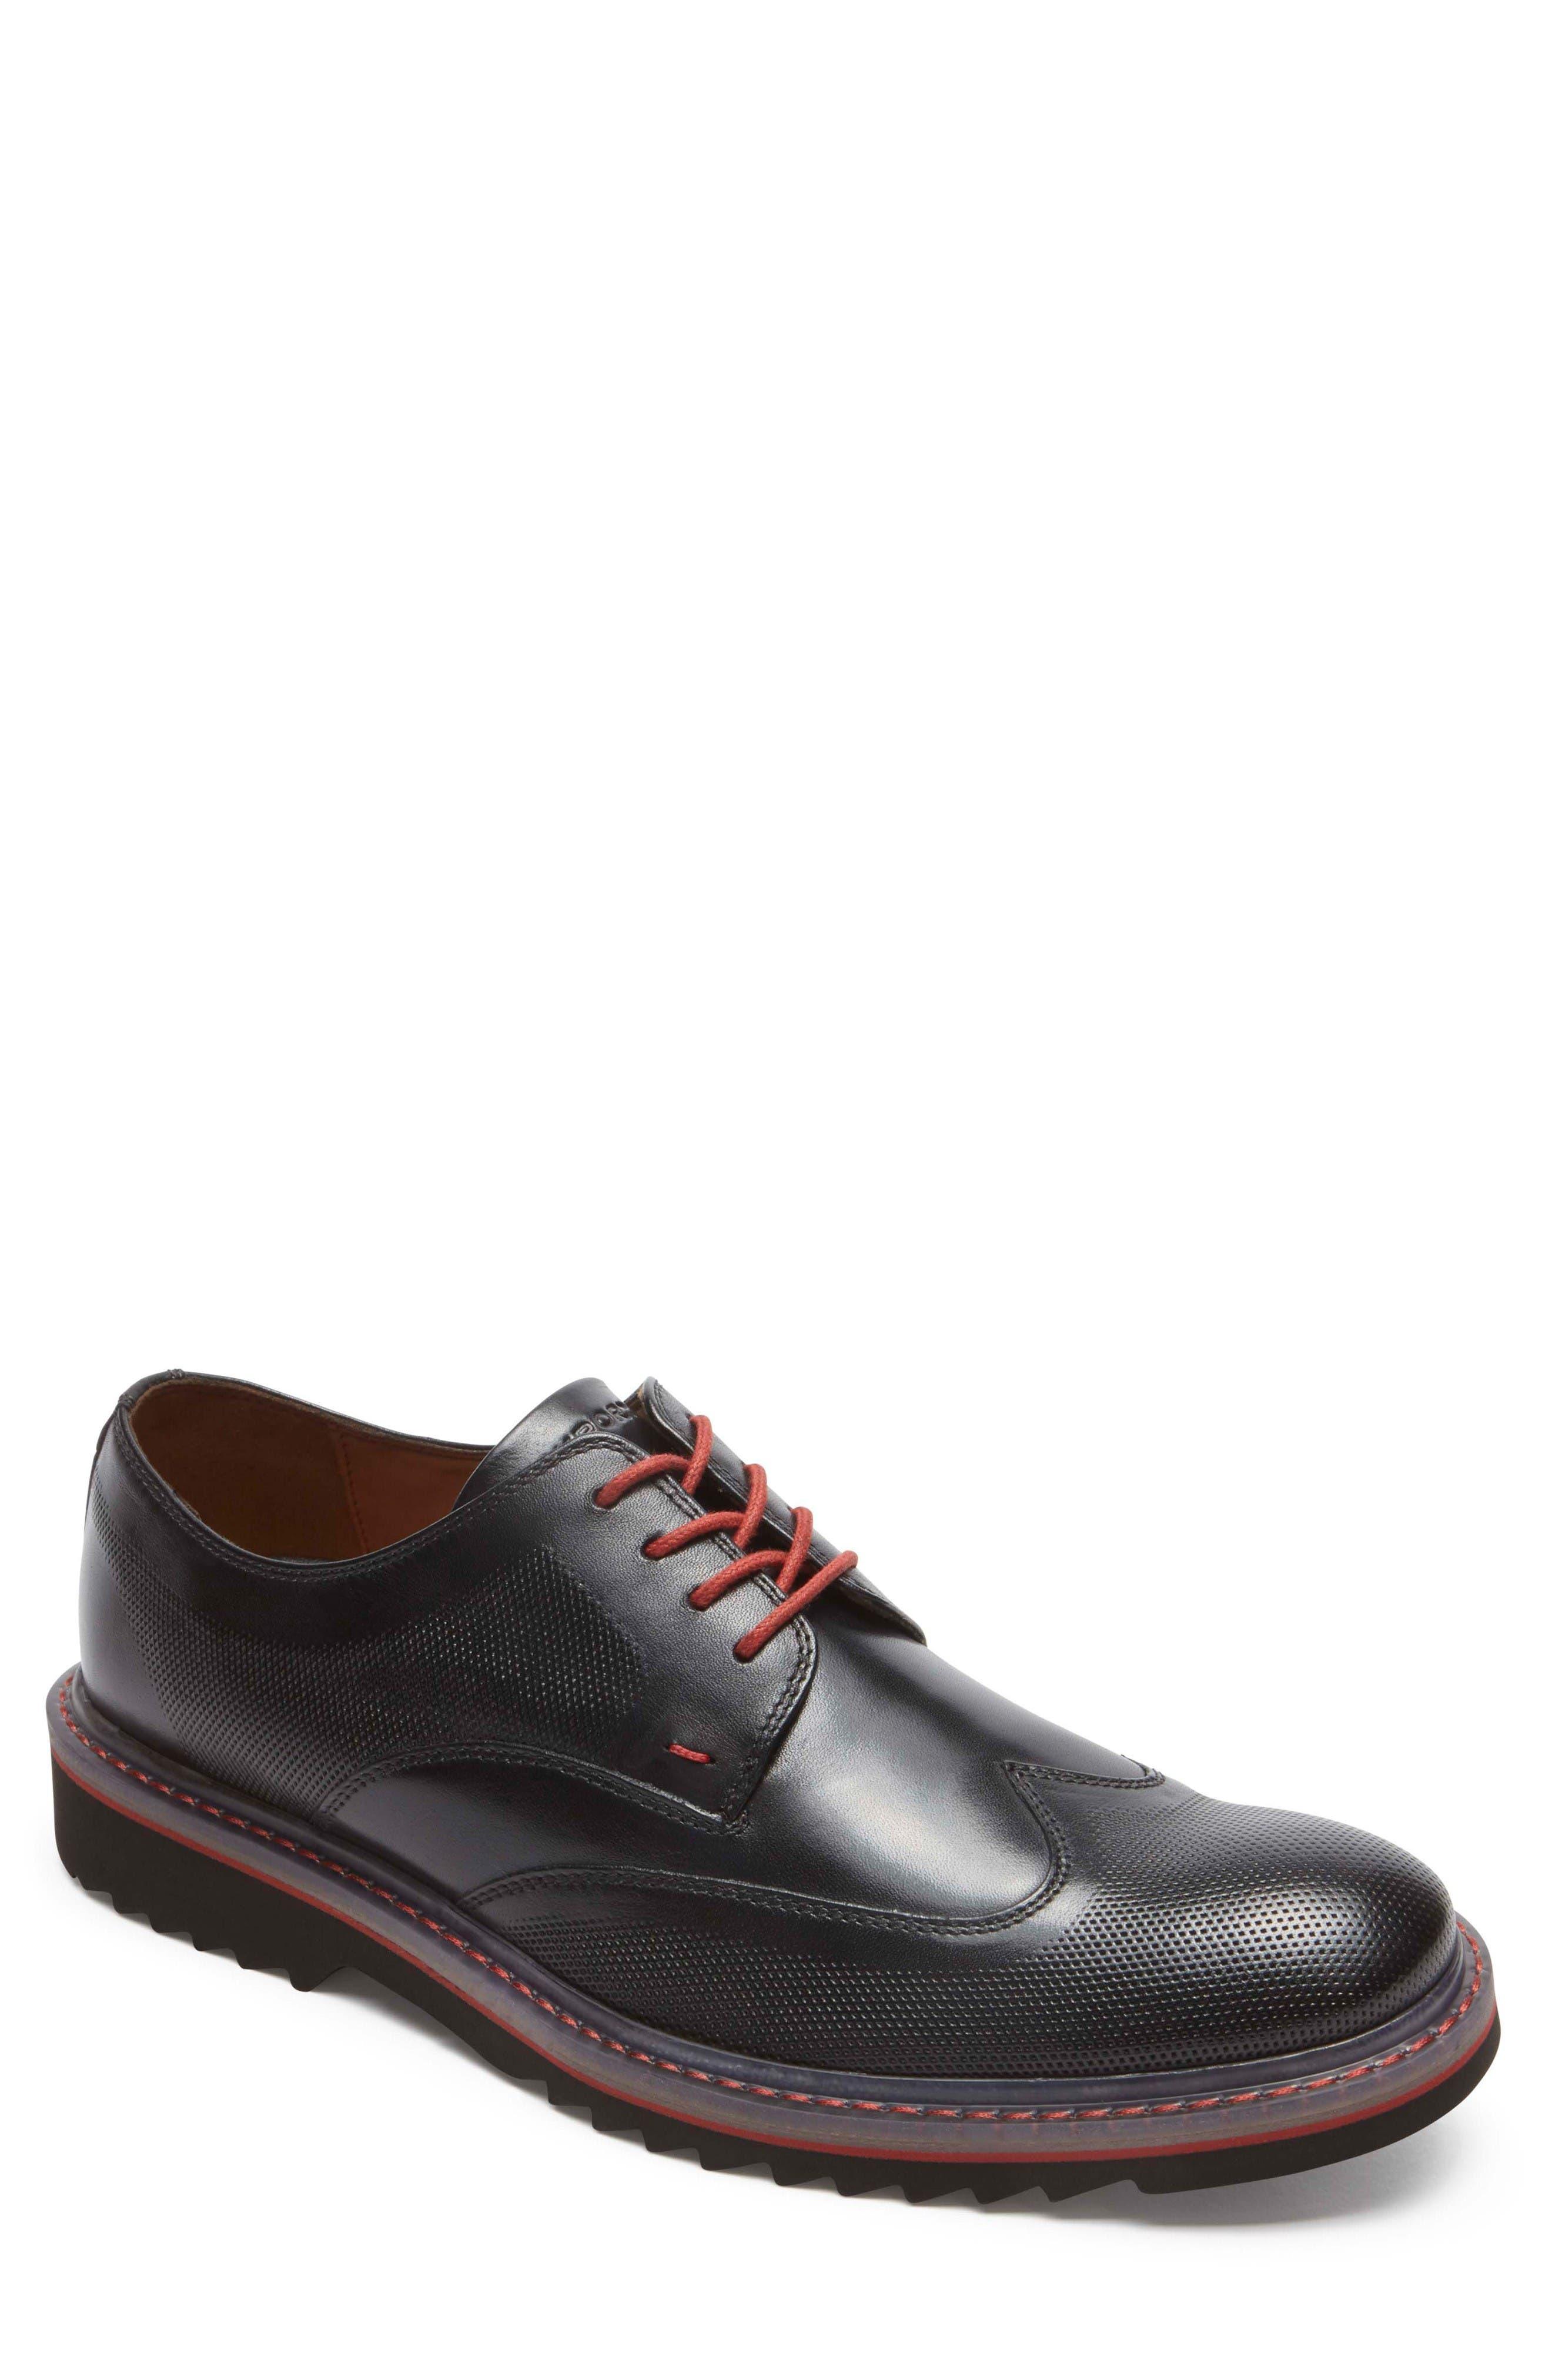 Jaxson Wingtip,                             Main thumbnail 1, color,                             Black Leather